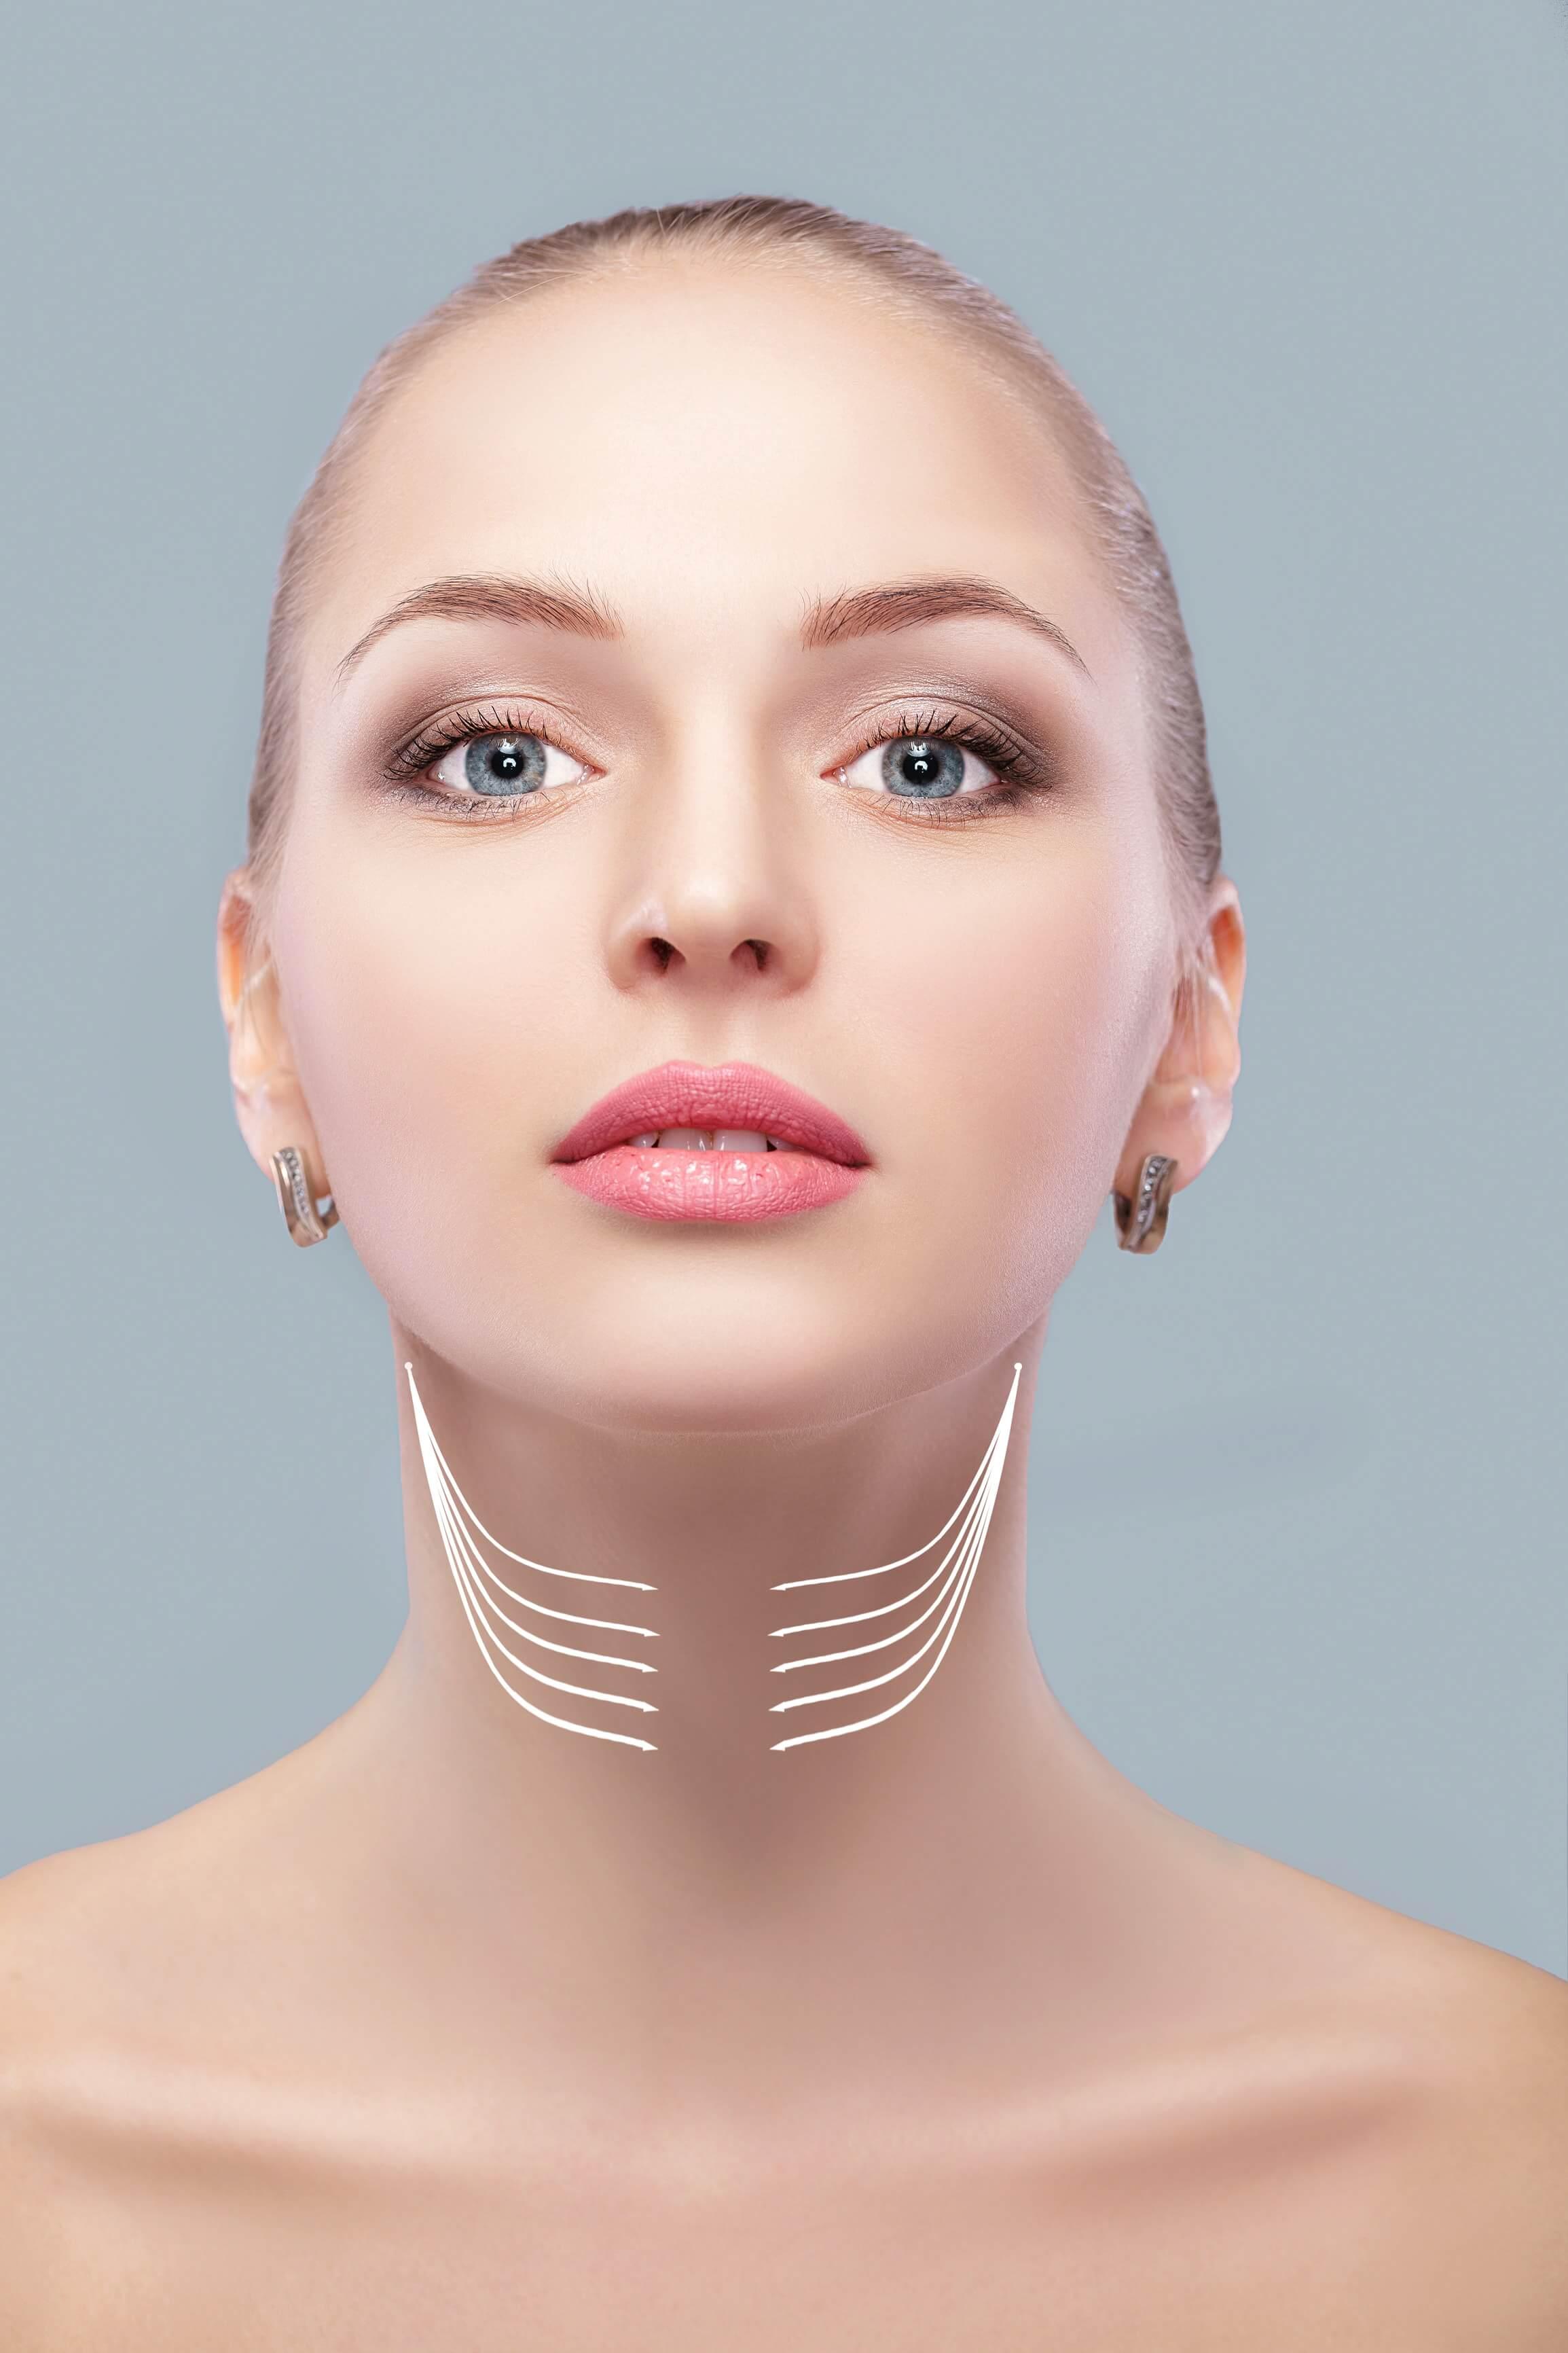 neck-lift-surgery